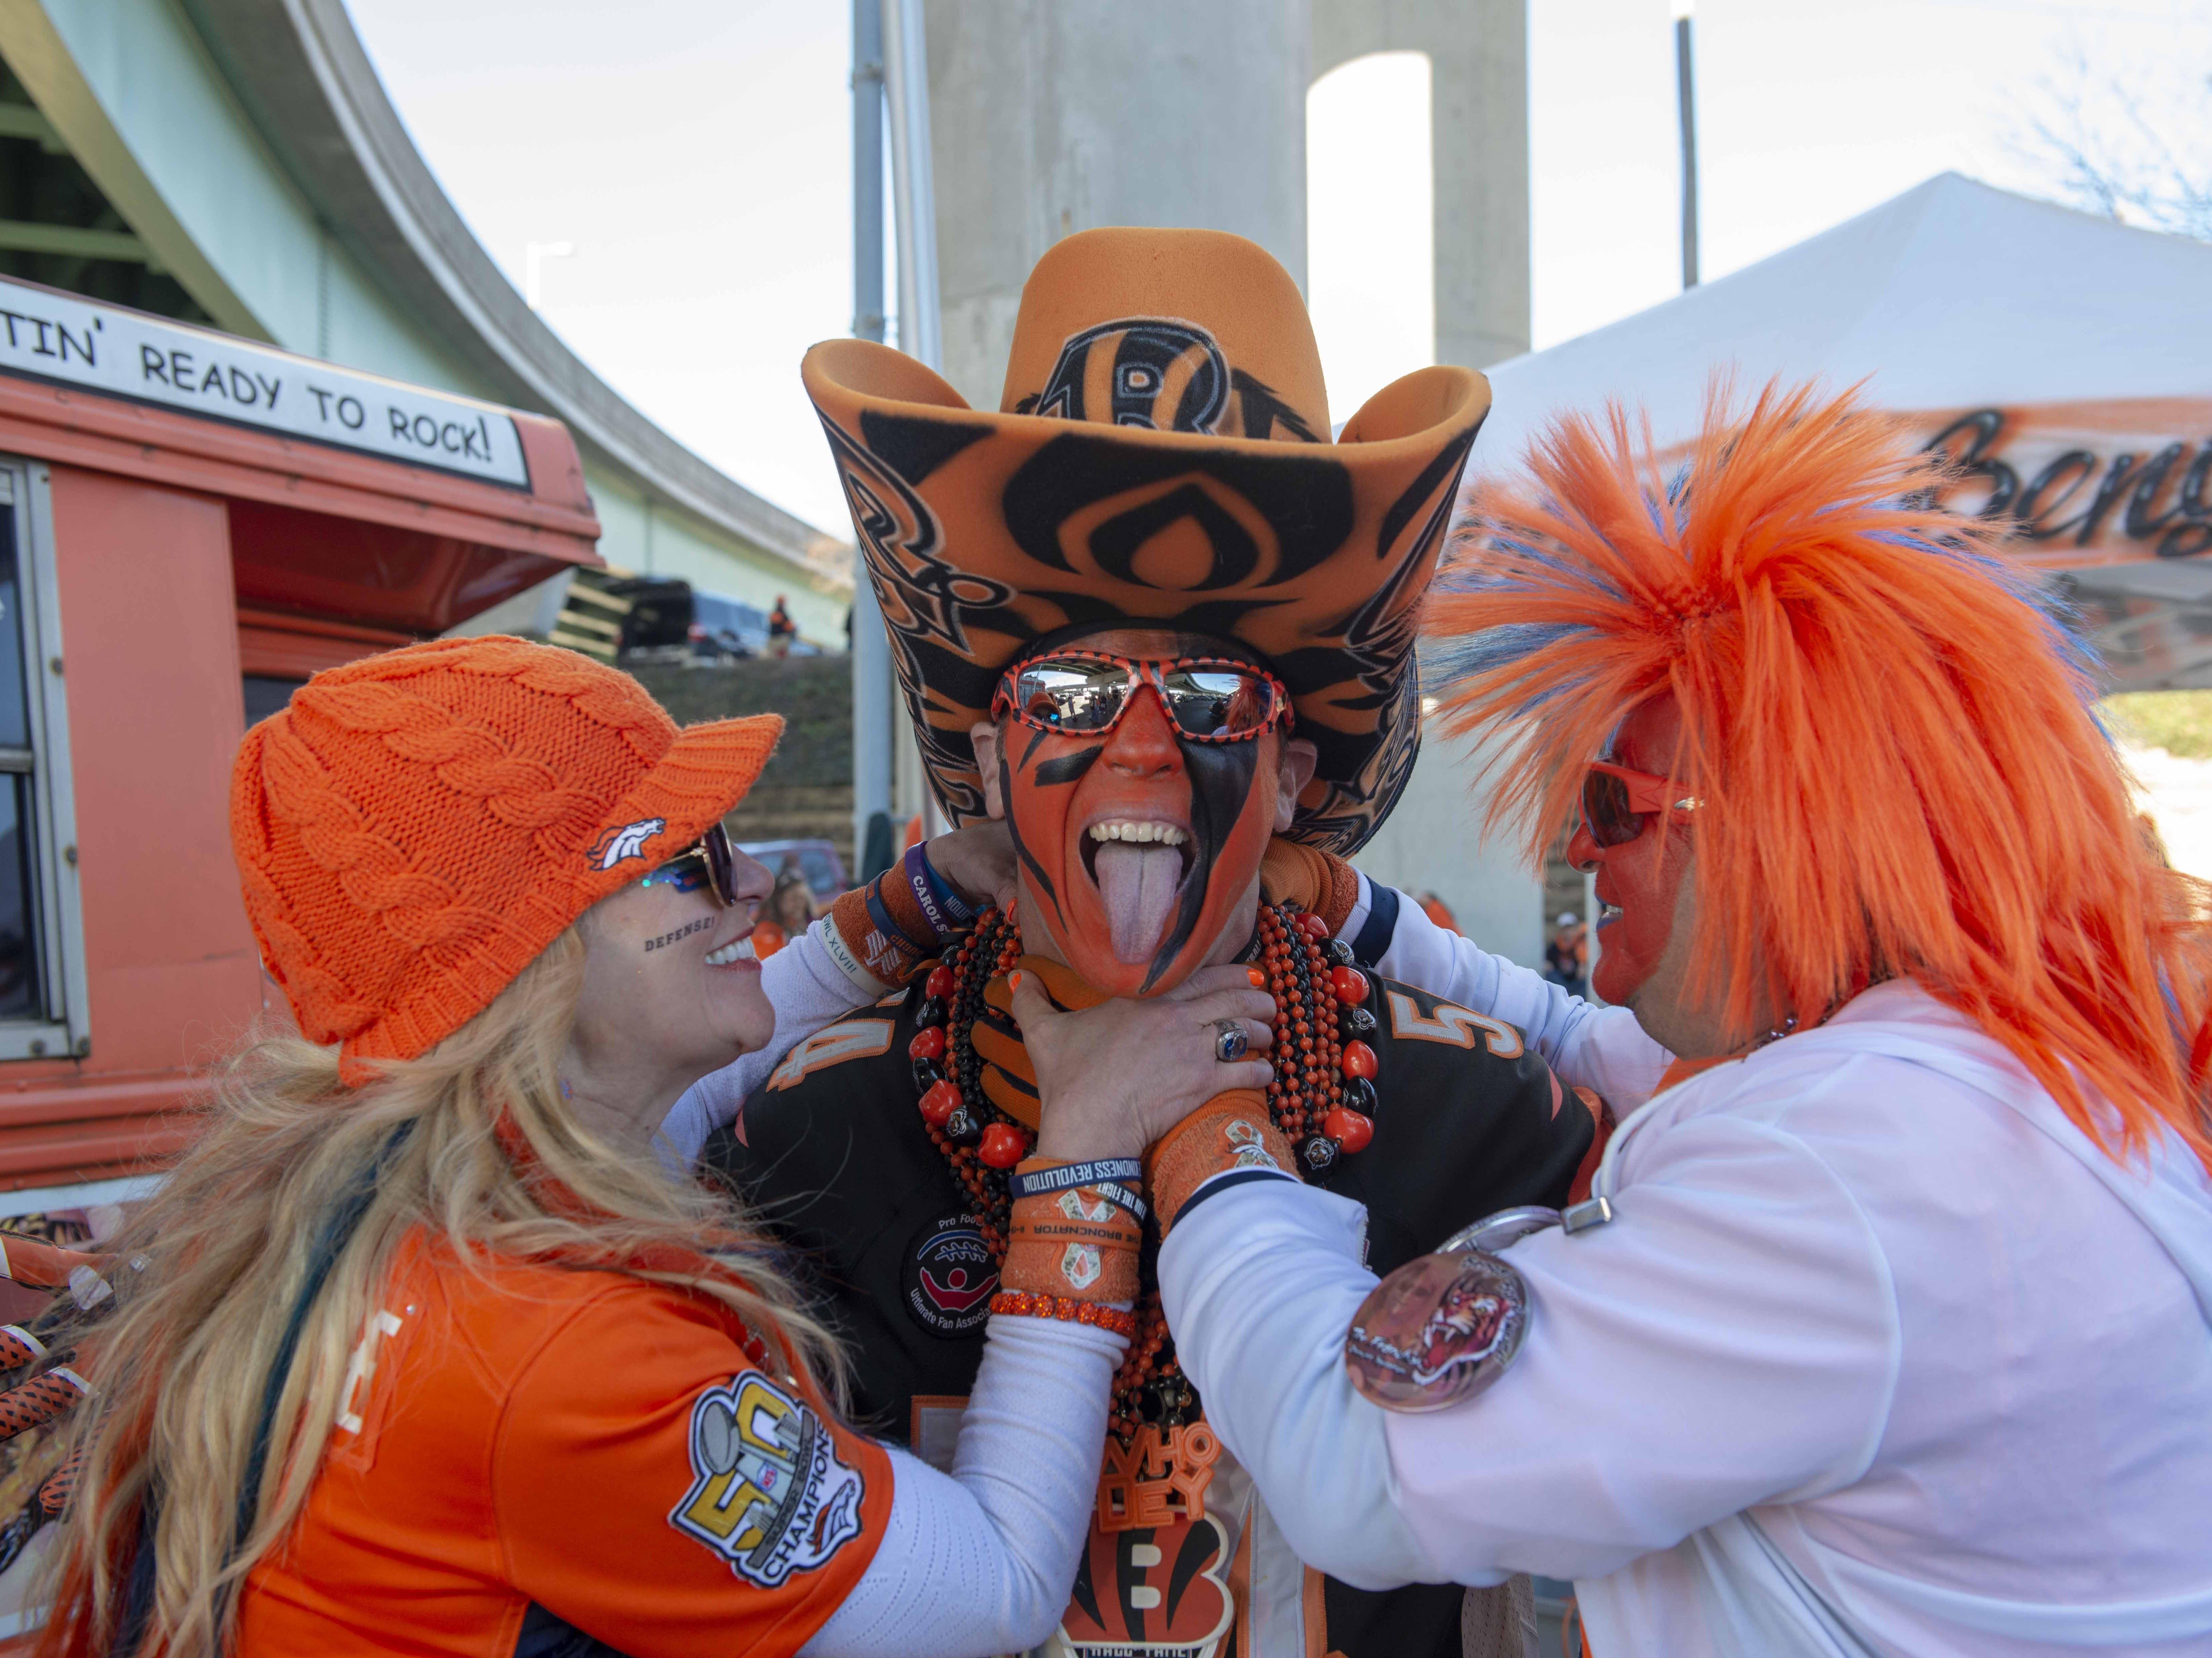 Cincinnati Bengals fans showed up for tailgating parties as the Cincinnati Bengals hosted the Denver Broncos at Paul Brown Stadium Sunday, December 2, 2018. Denver Bronco fans Catherine Highland and Ken Castaneda attack Who Dey Baby.